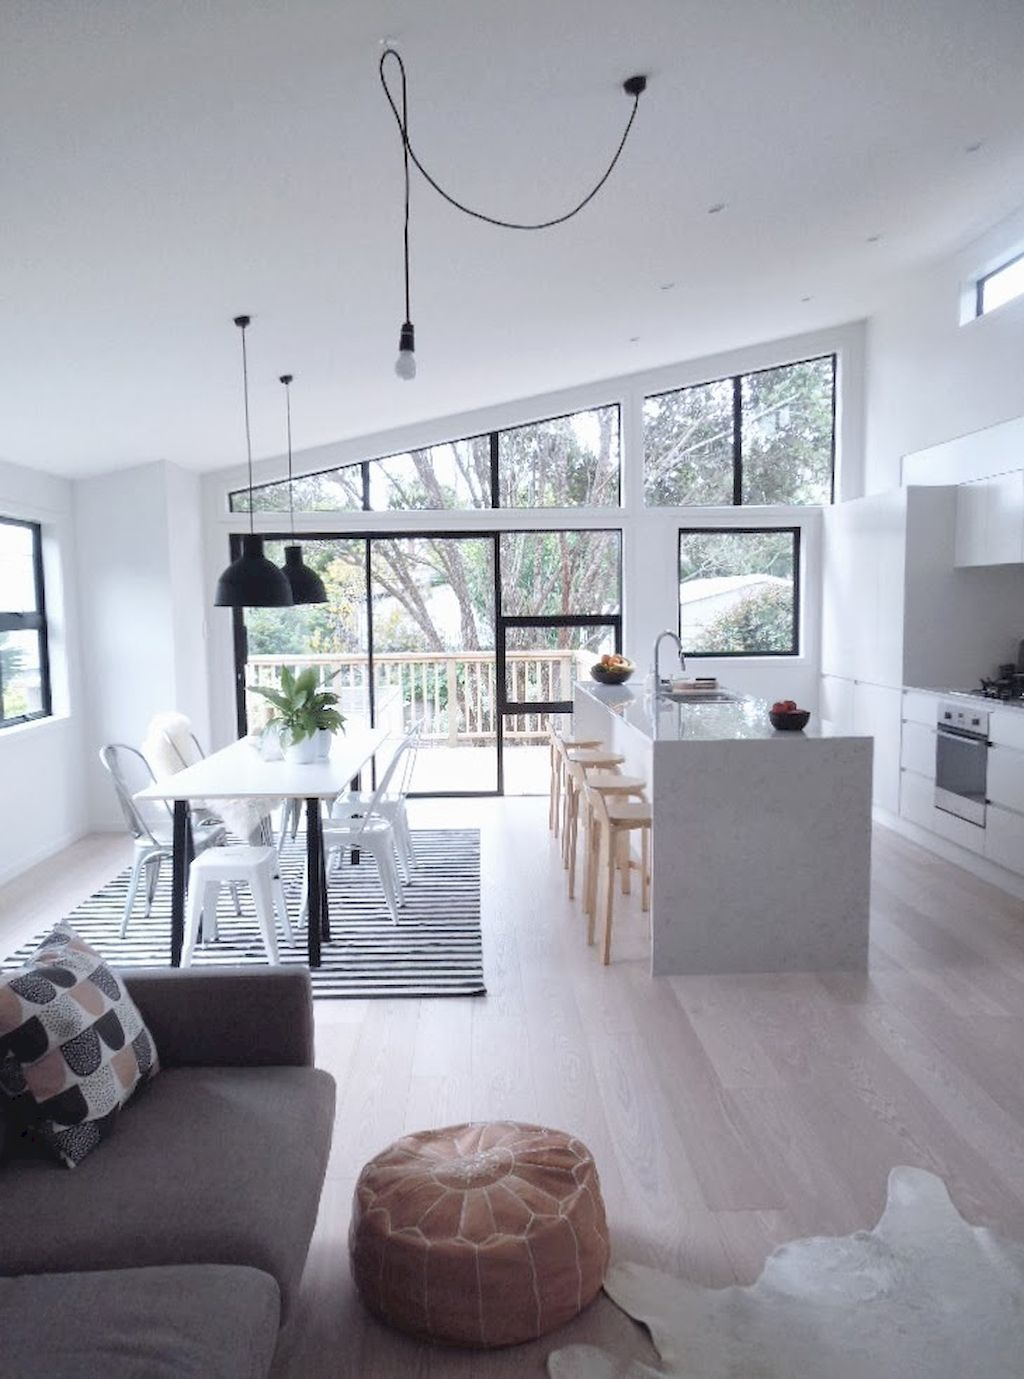 100 Scandinavian Kitchen Design Ideas Remodel House Interior Home Interior